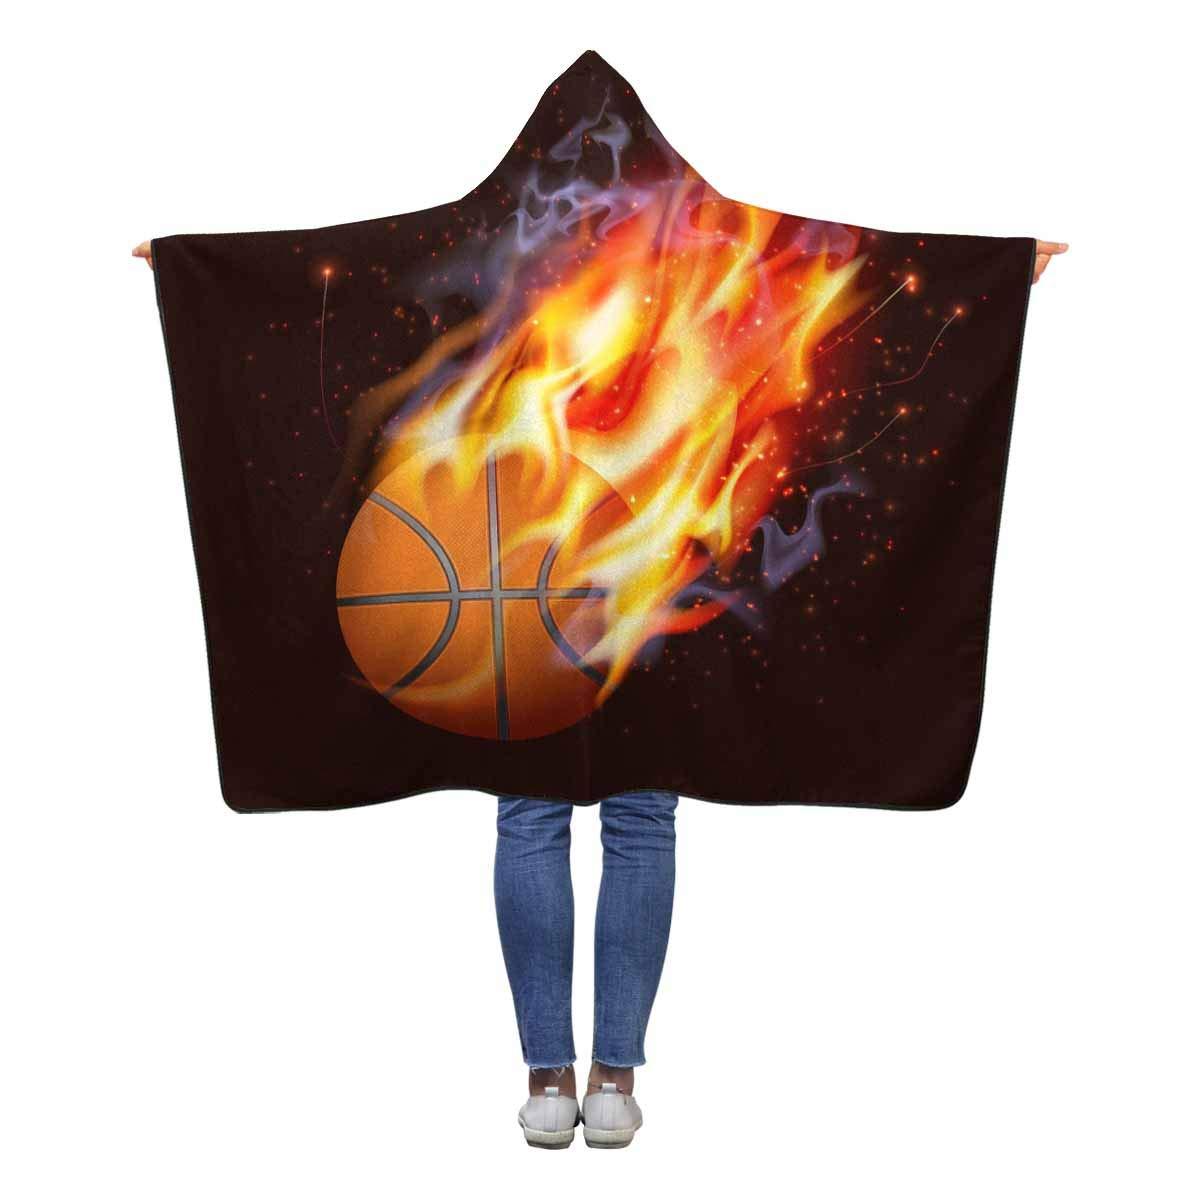 InterestPrint バスケットボール B07LCD3NLK 耐火 フード付きブランケット 60 x 50インチ 子供 ラップ 女の子 50インチ 男の子 幼児 スロー ポーラーフリース ブランケット ラップ B07LCD3NLK, ベルセーブ:4ffd7a48 --- ijpba.info